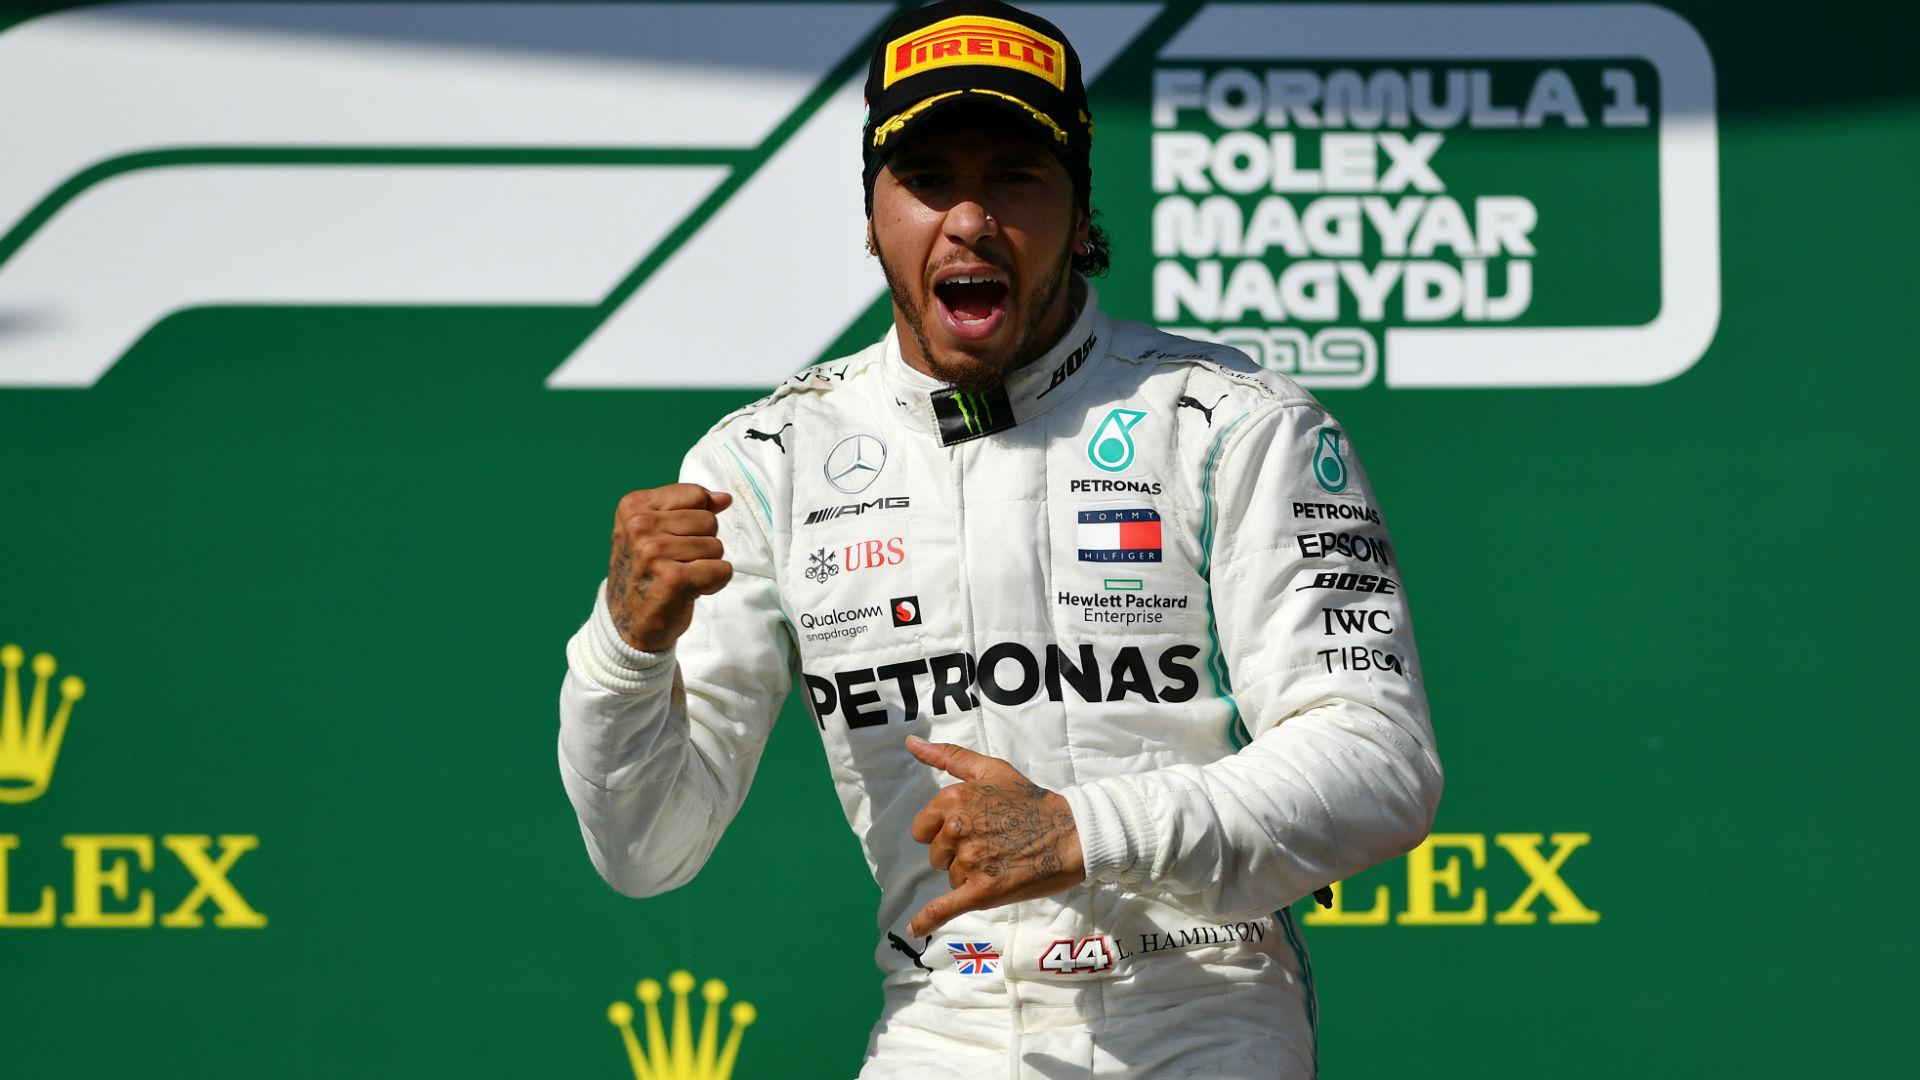 Hamilton not contemplating quitting Formula One